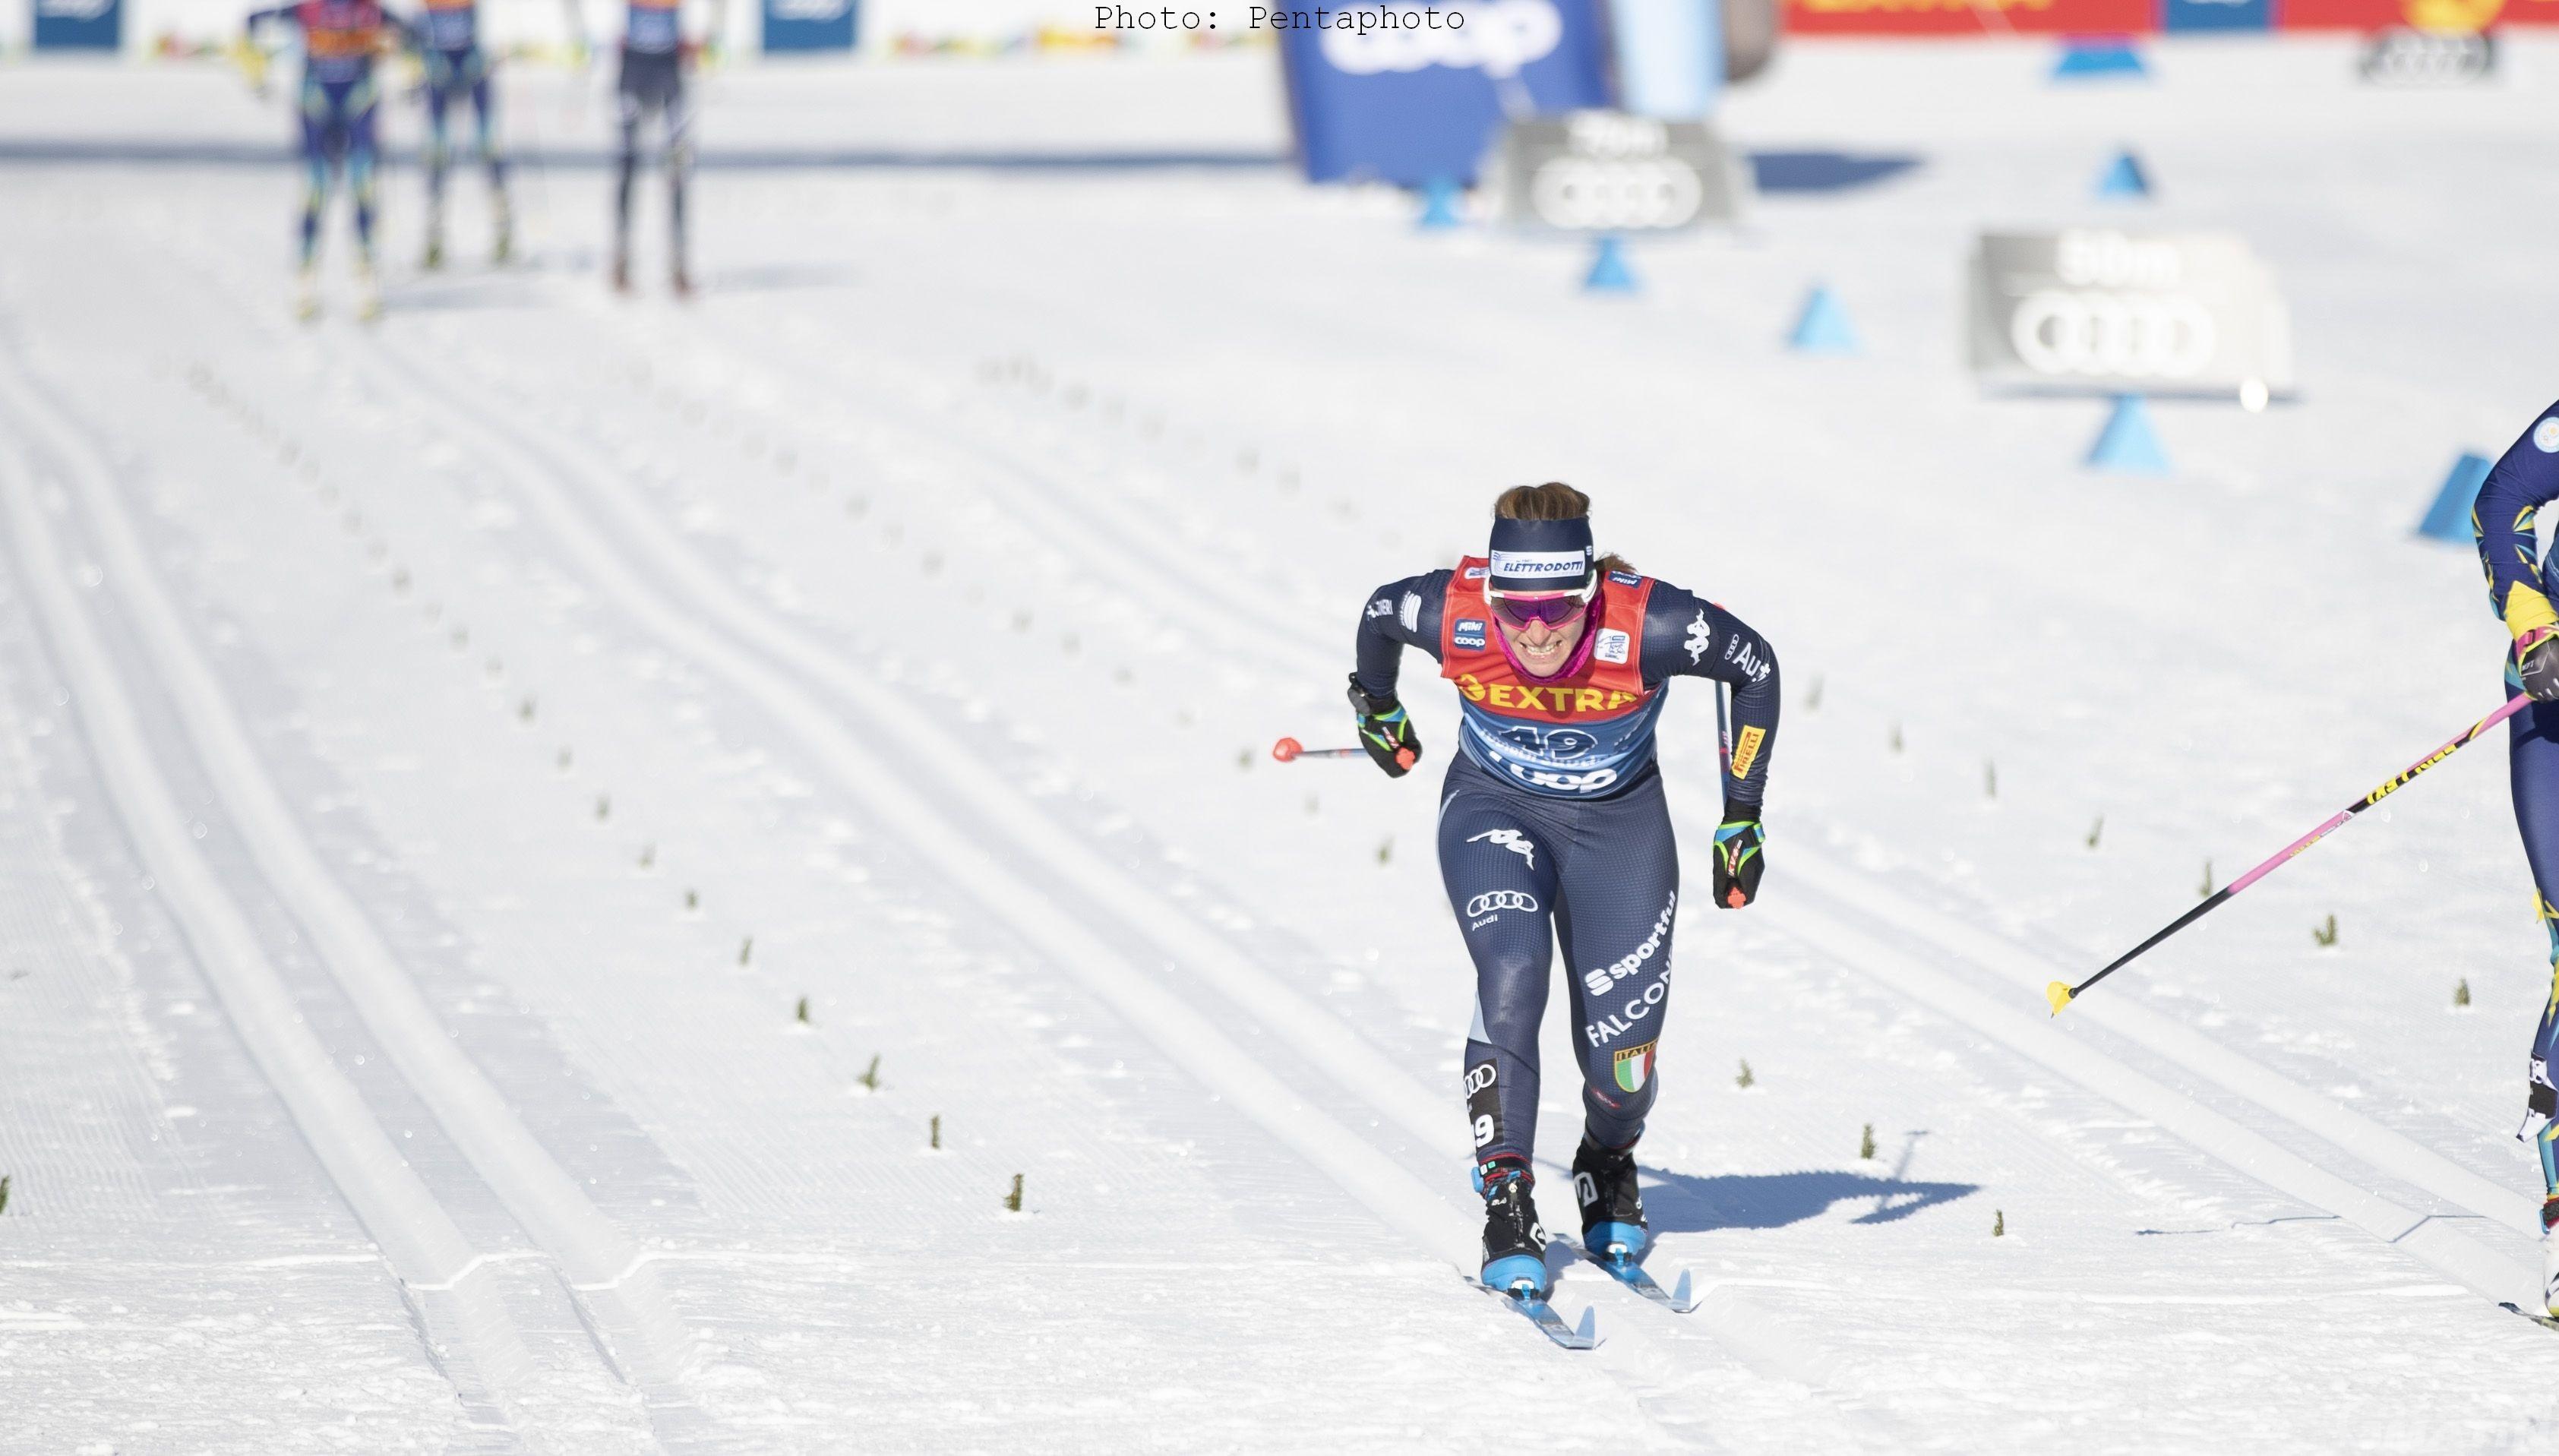 Fondo: Pellegrino, De Fabiani, Laurent e Brocard al via del Tour de Ski